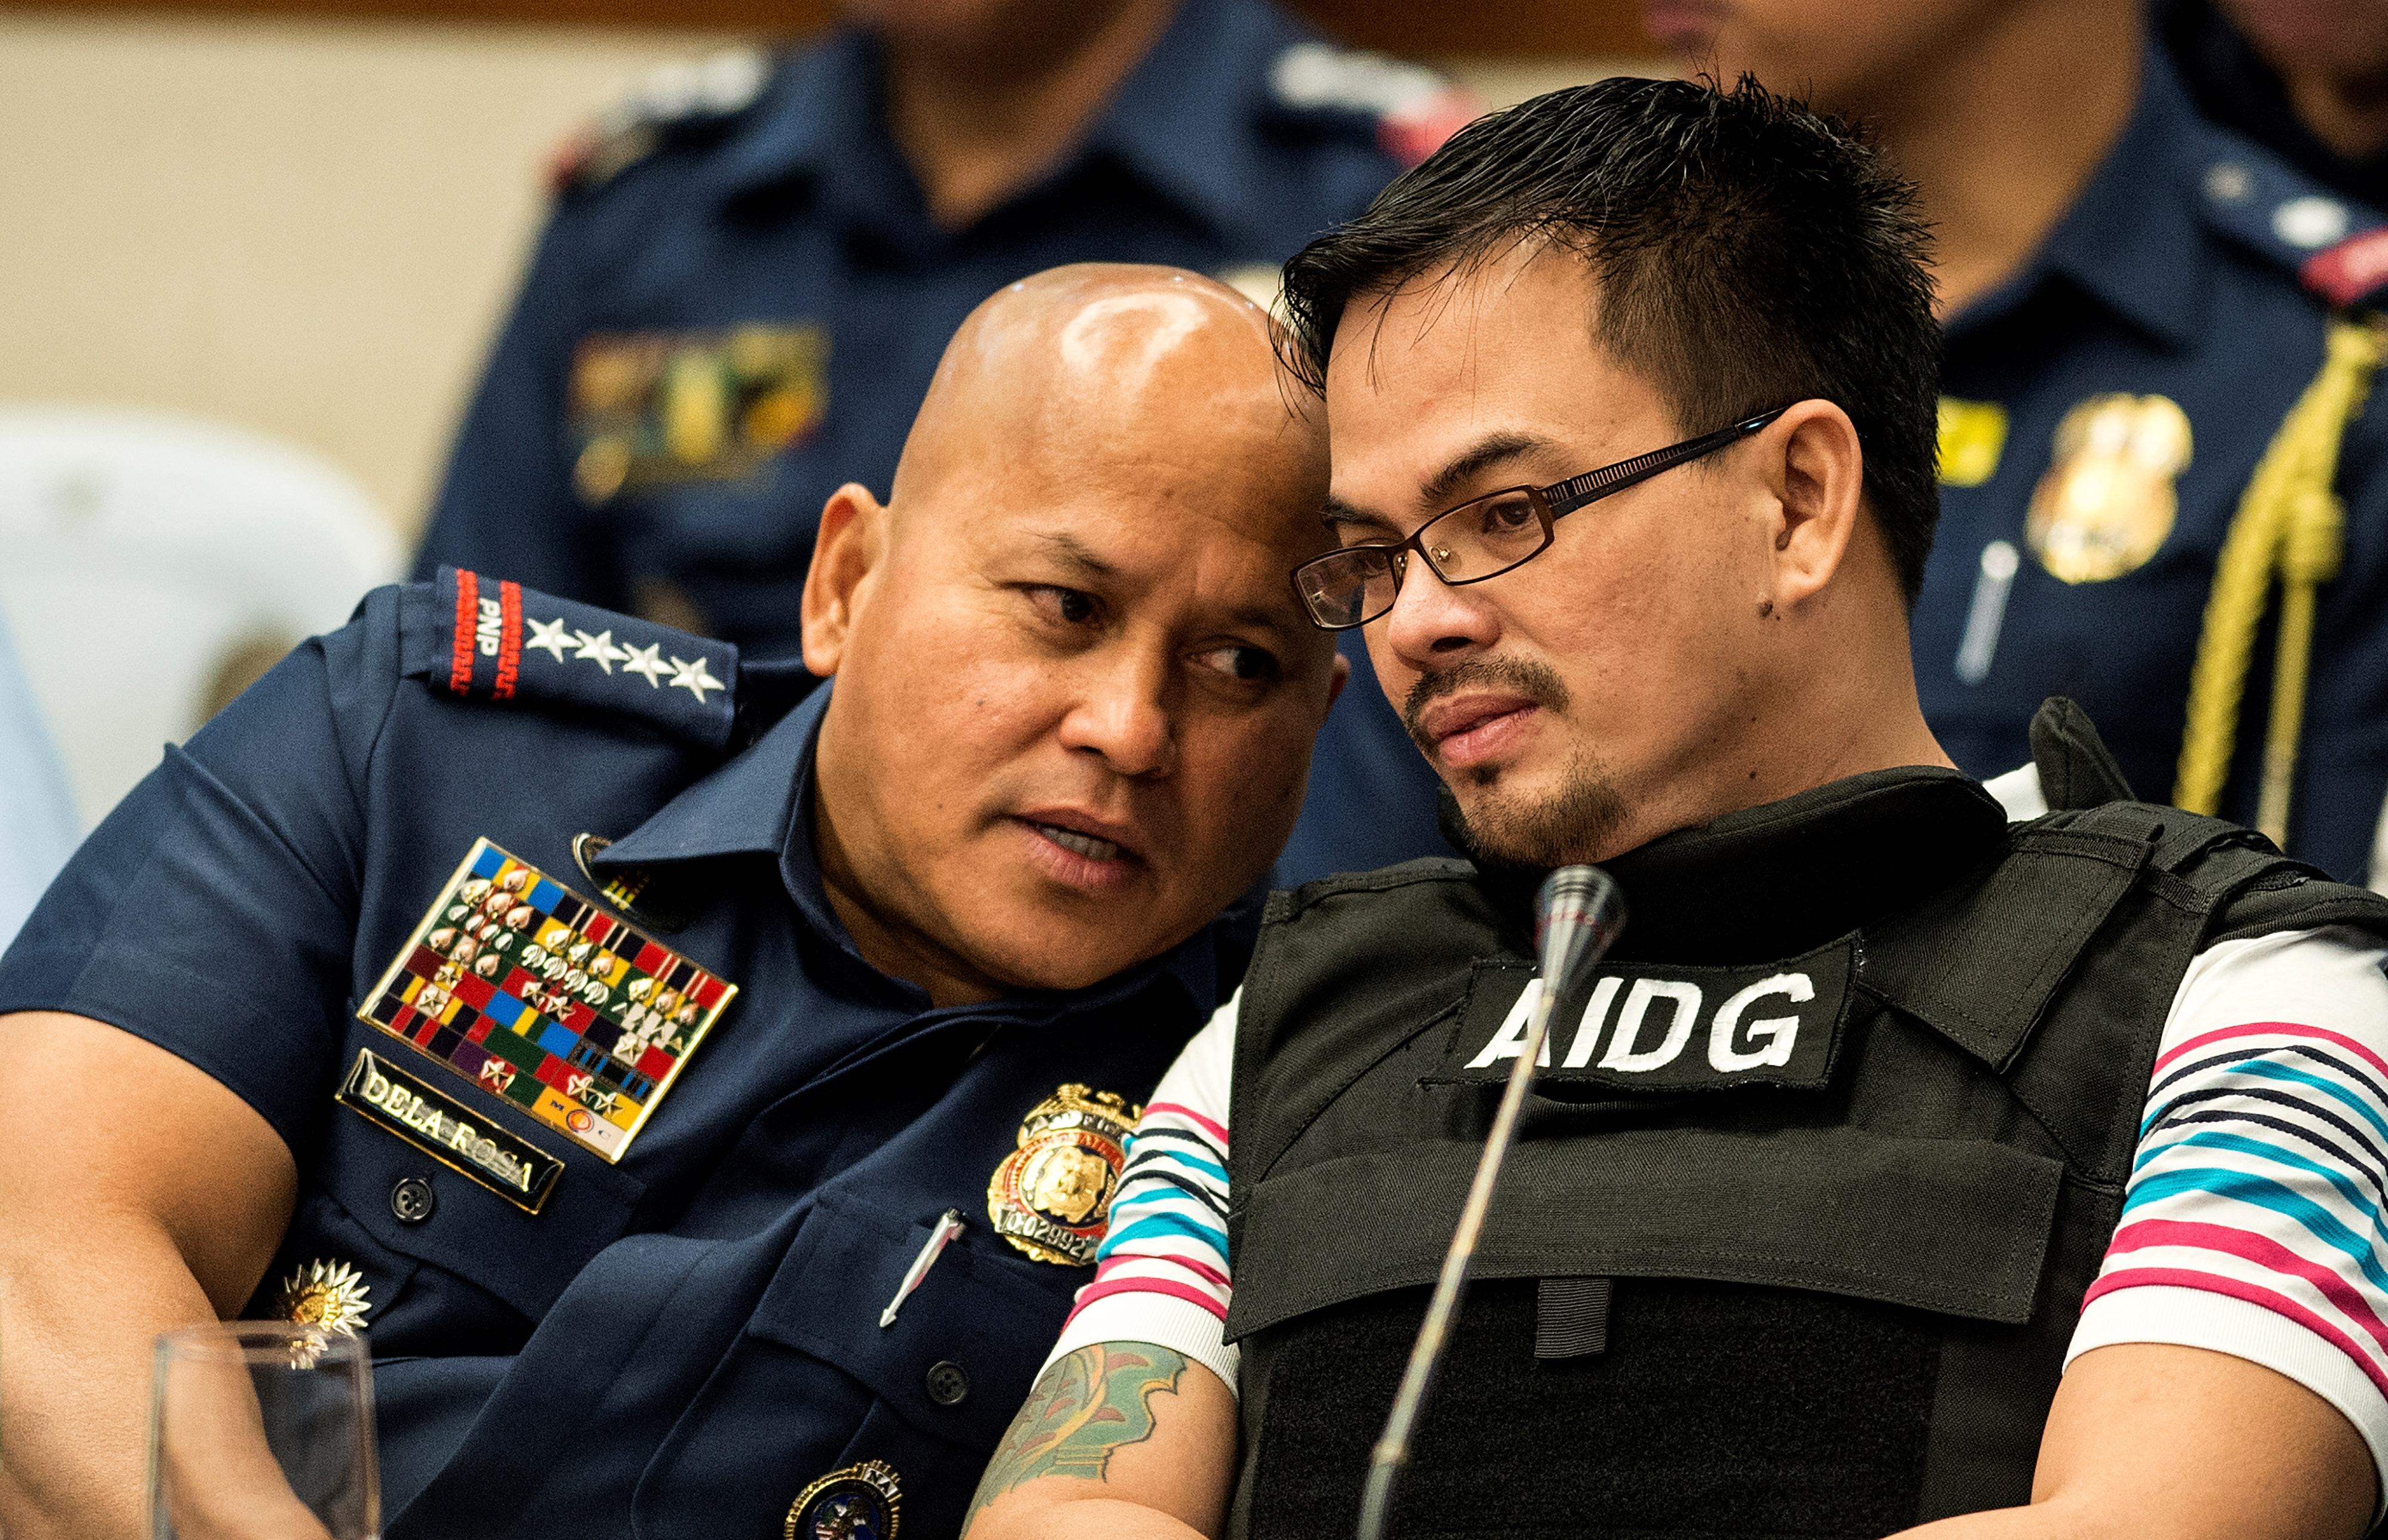 The Philippines' police chief Ronald dela Rosa, left, talks to Kerwin Espinosa son of the late Albuera Mayor Rolando Espinosa at the Senate building in Manila on Nov. 23, 2016